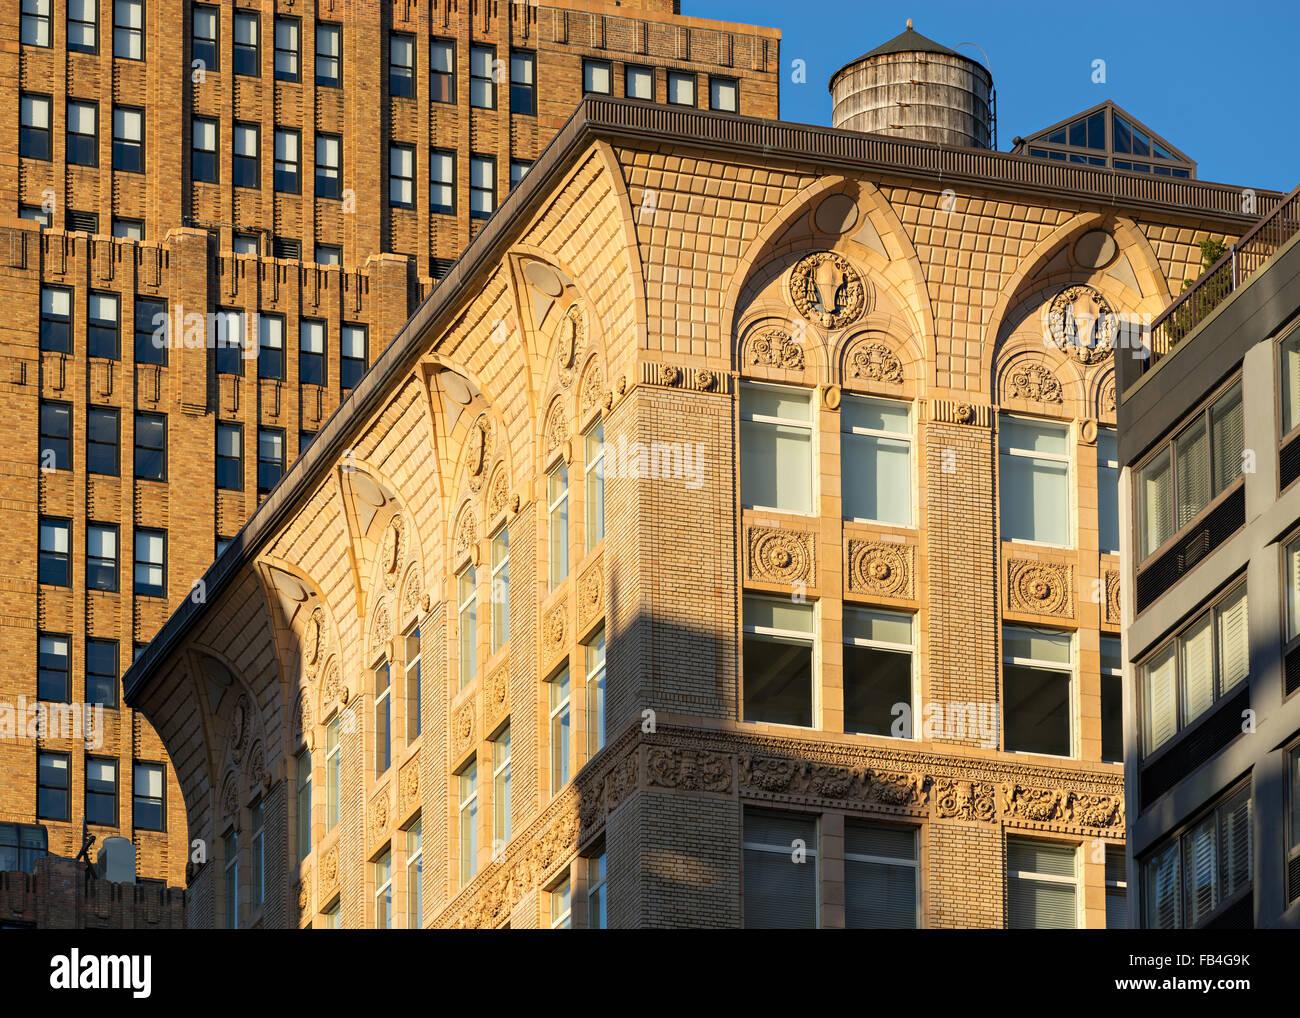 Terrakotta-Ornament, Rams Köpfe, Garland und Spitzbögen Ofna Chelsea loft-Gebäude in Manhattan, New Stockbild